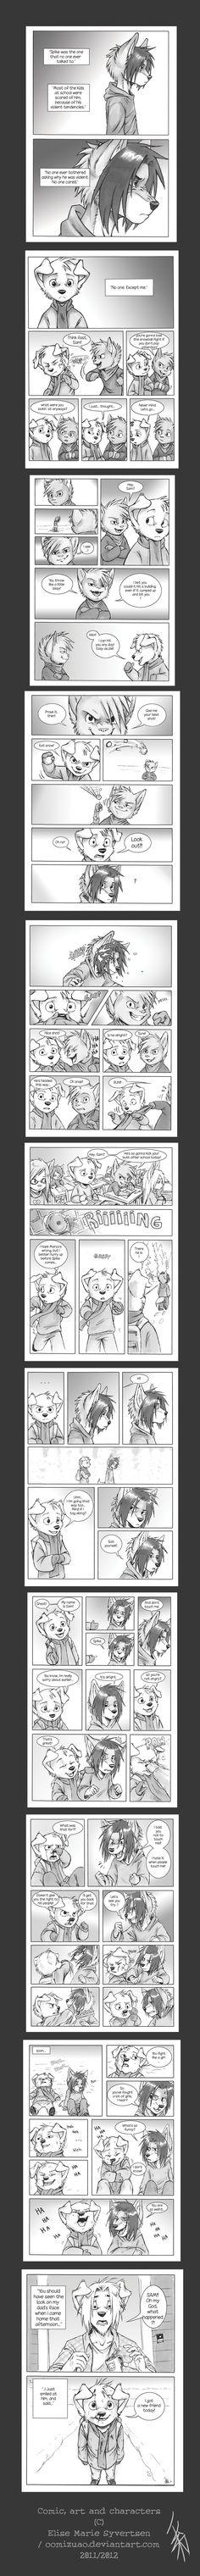 COMIC -Snow- updated by oomizuao on DeviantArt Old Comics, Cute Comics, Manga Comics, Creature Drawings, Animal Drawings, Furry Comic, Anthro Furry, Im Crazy, Zootopia